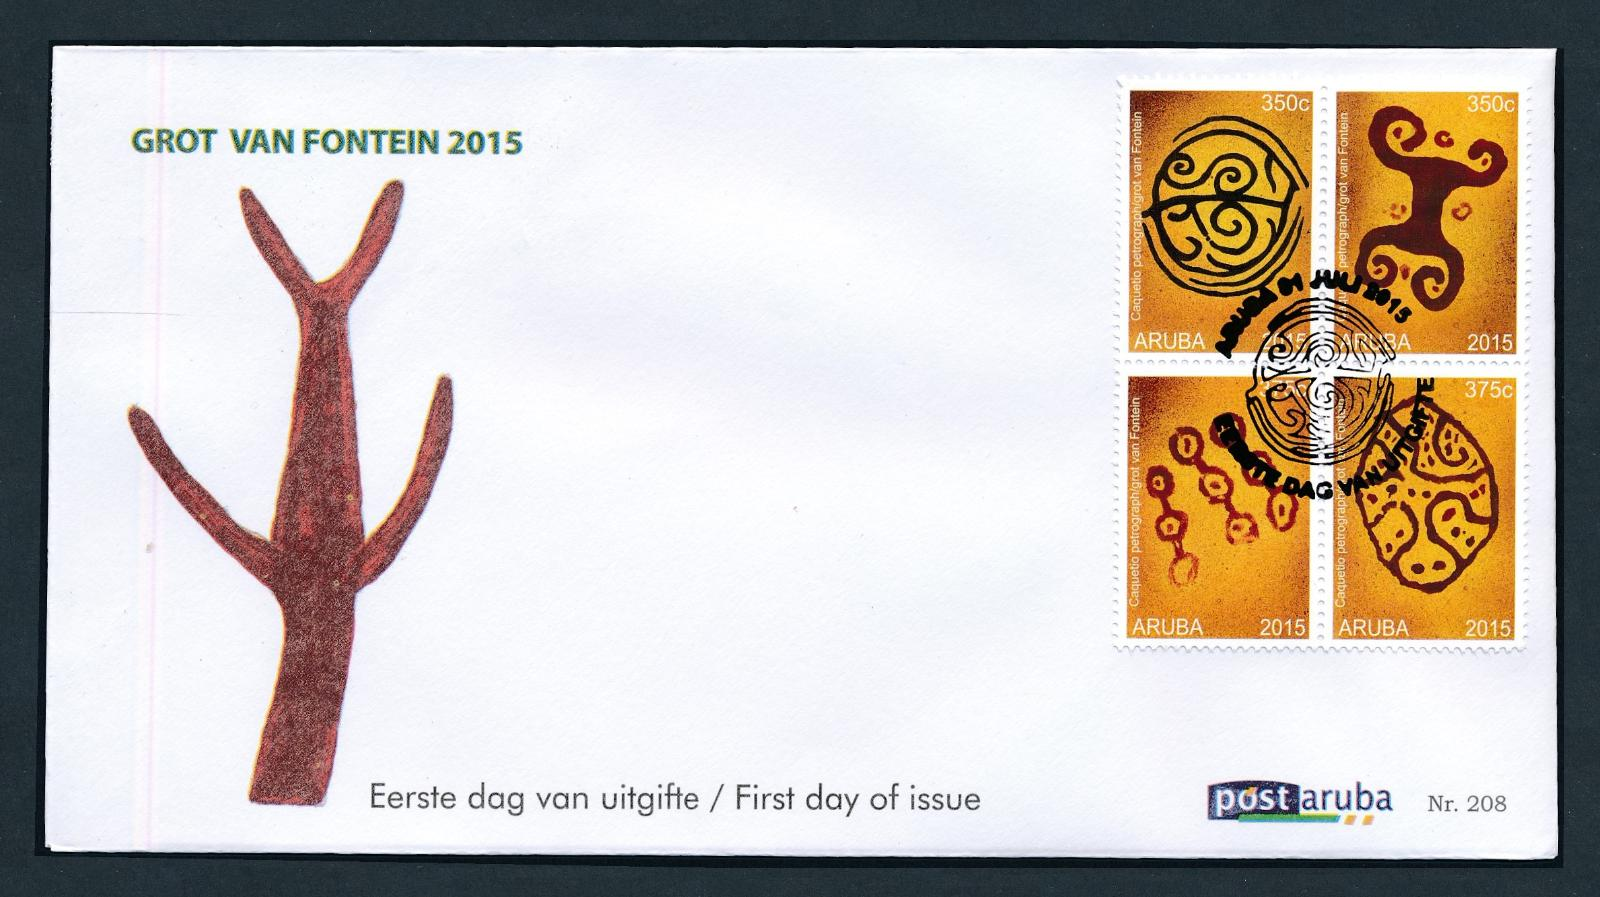 Aruba 2015 FDC Grot van Fontein, Grotkunst  E 208